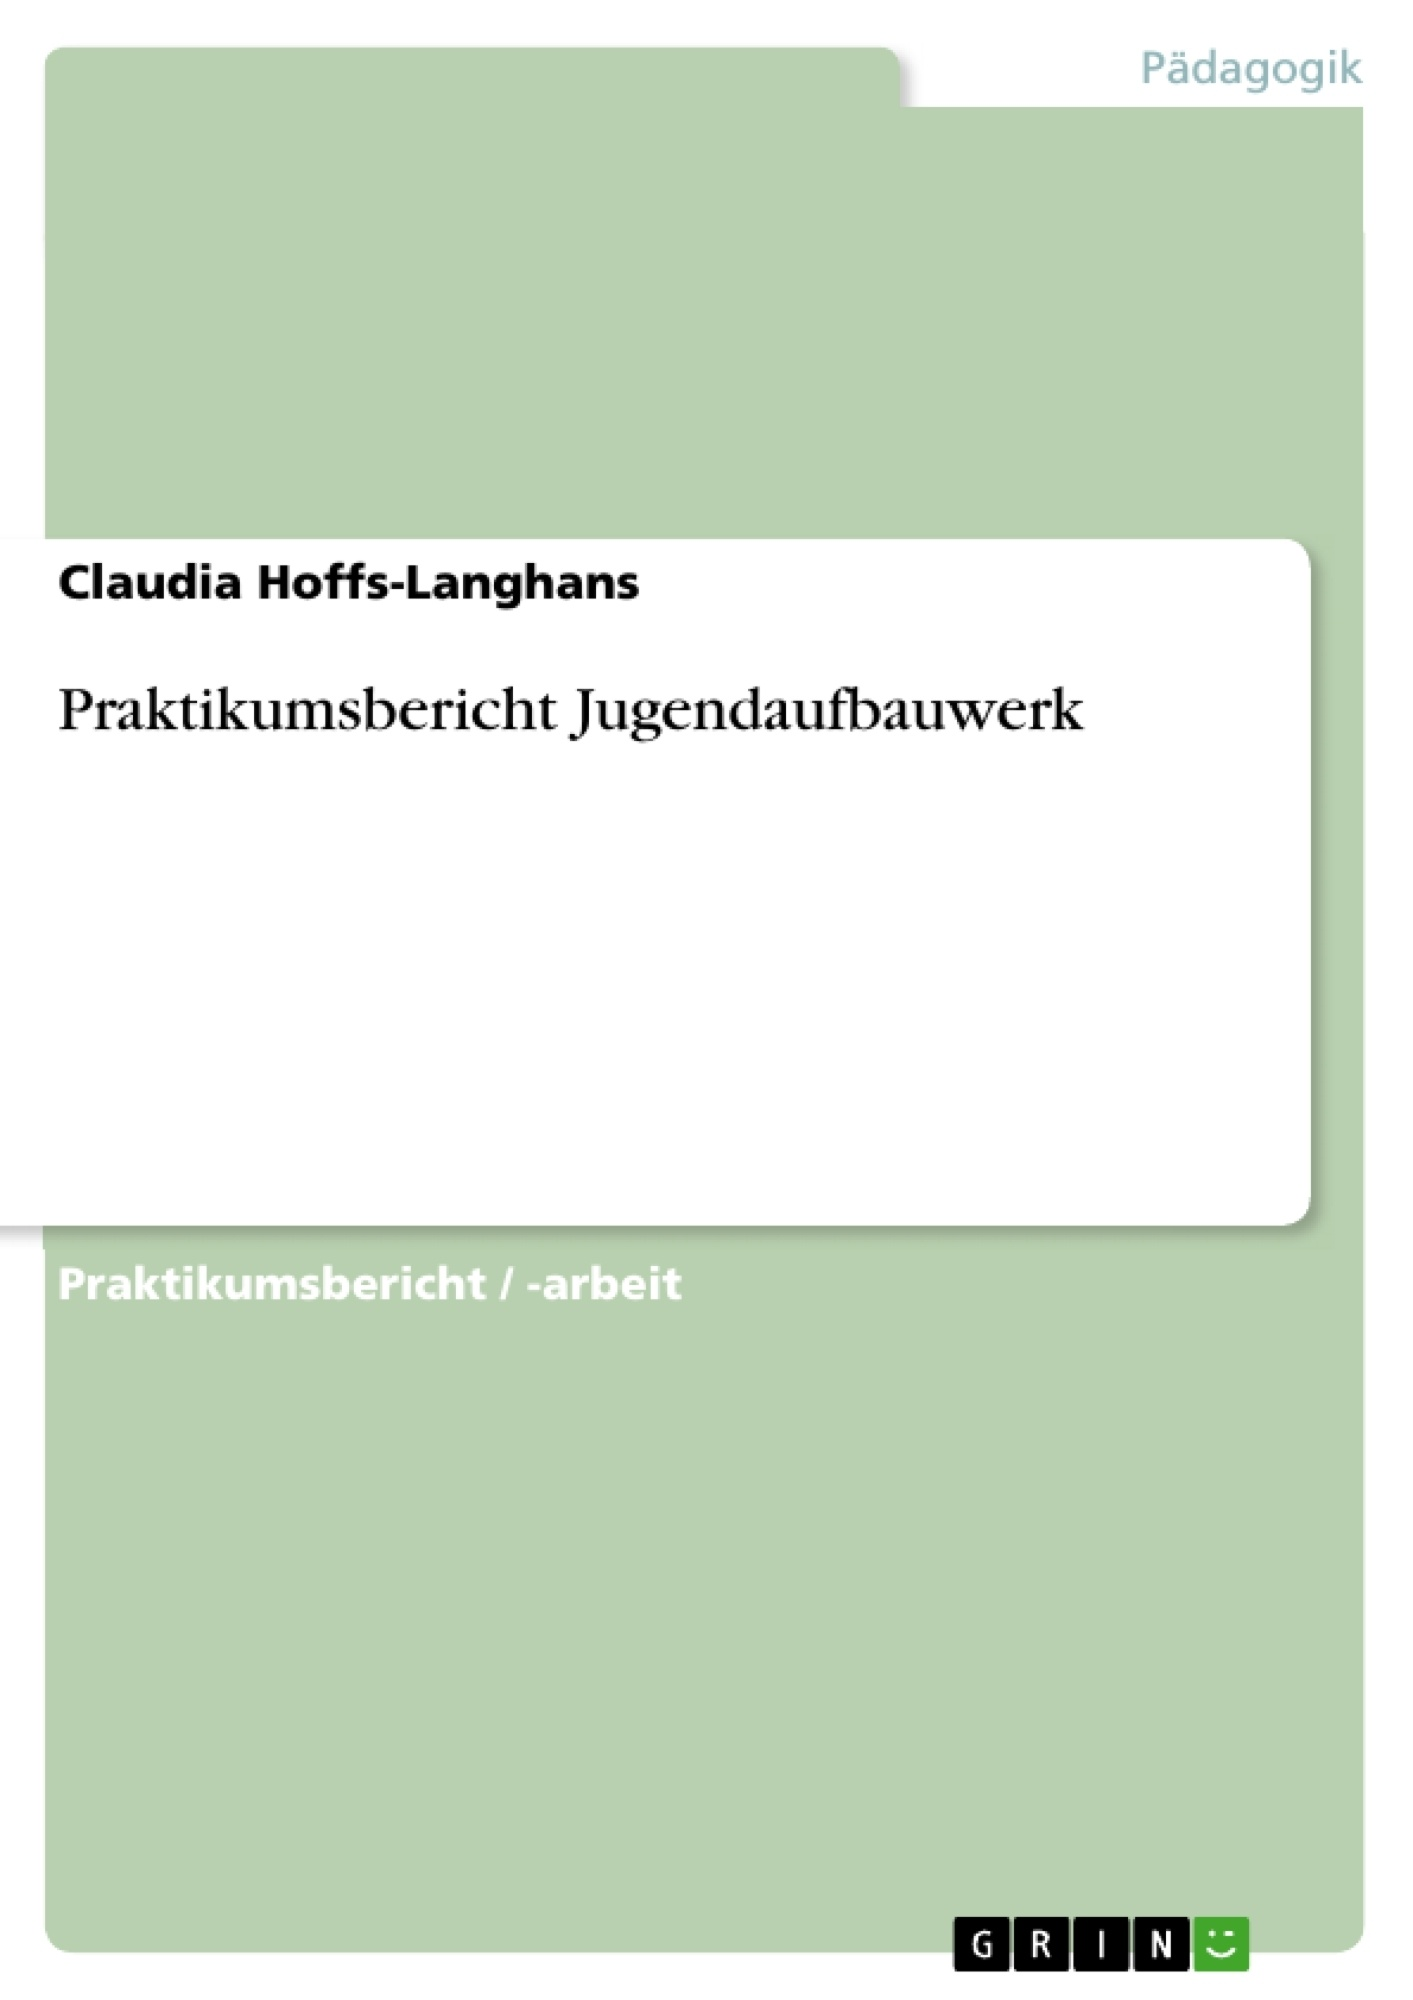 Titel: Praktikumsbericht Jugendaufbauwerk